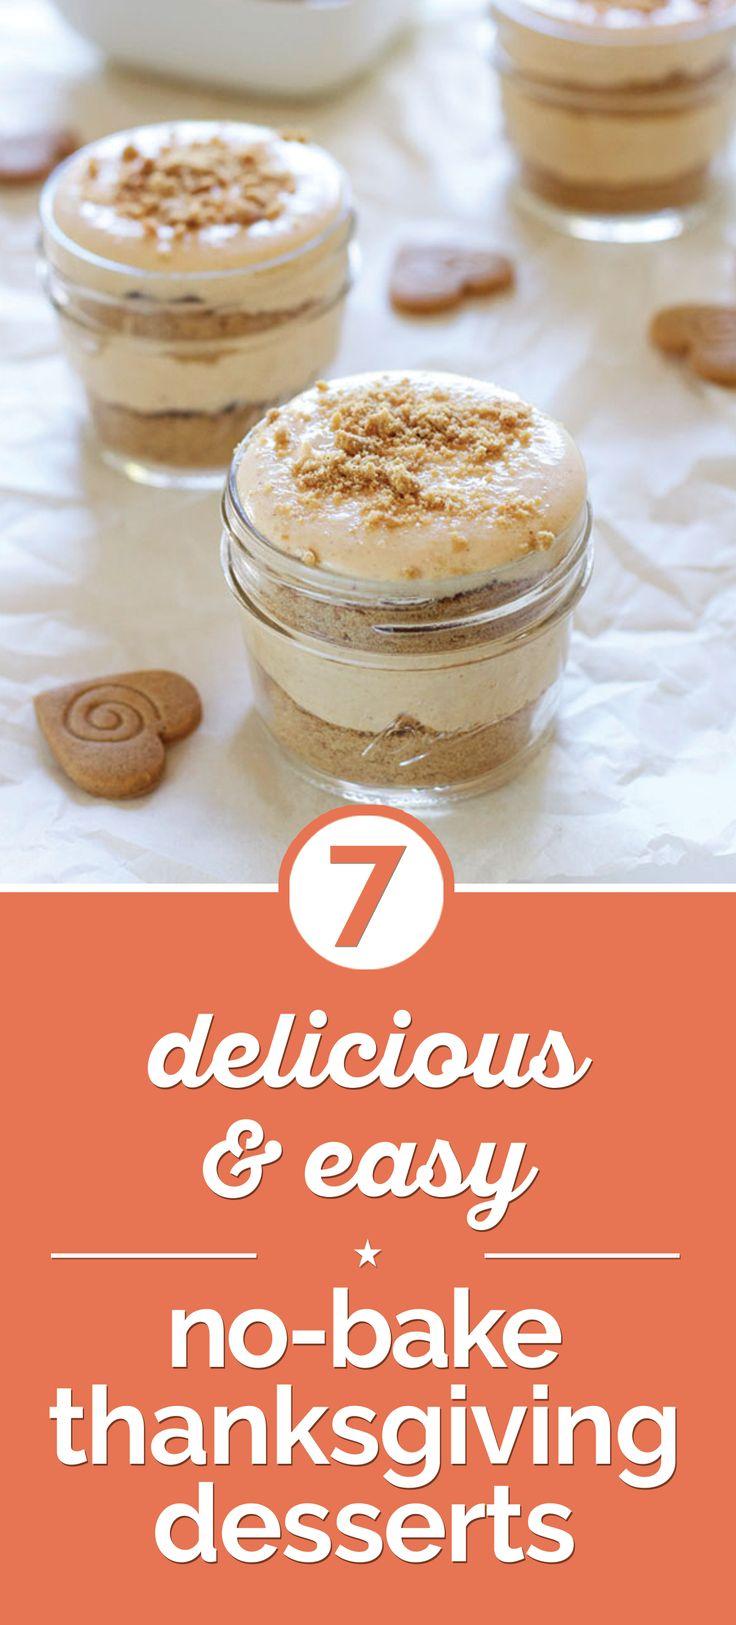 Thanksgiving No-Bake Dessert Recipes